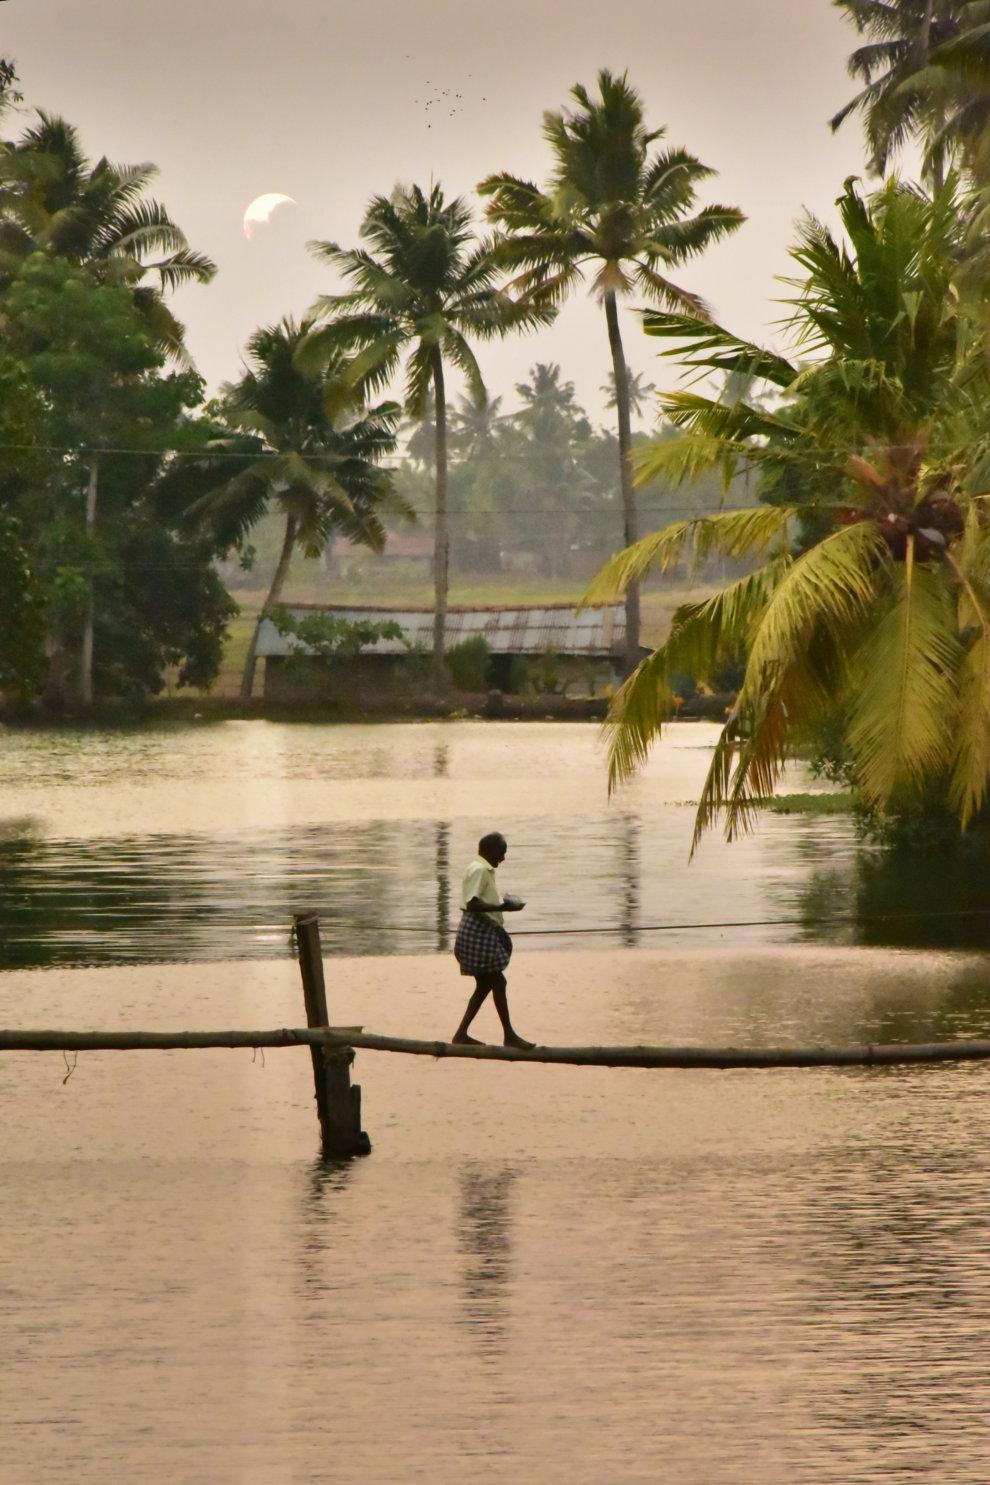 Kerala backwaters houseboat AllepeyKerala backwaters houseboat Allepey